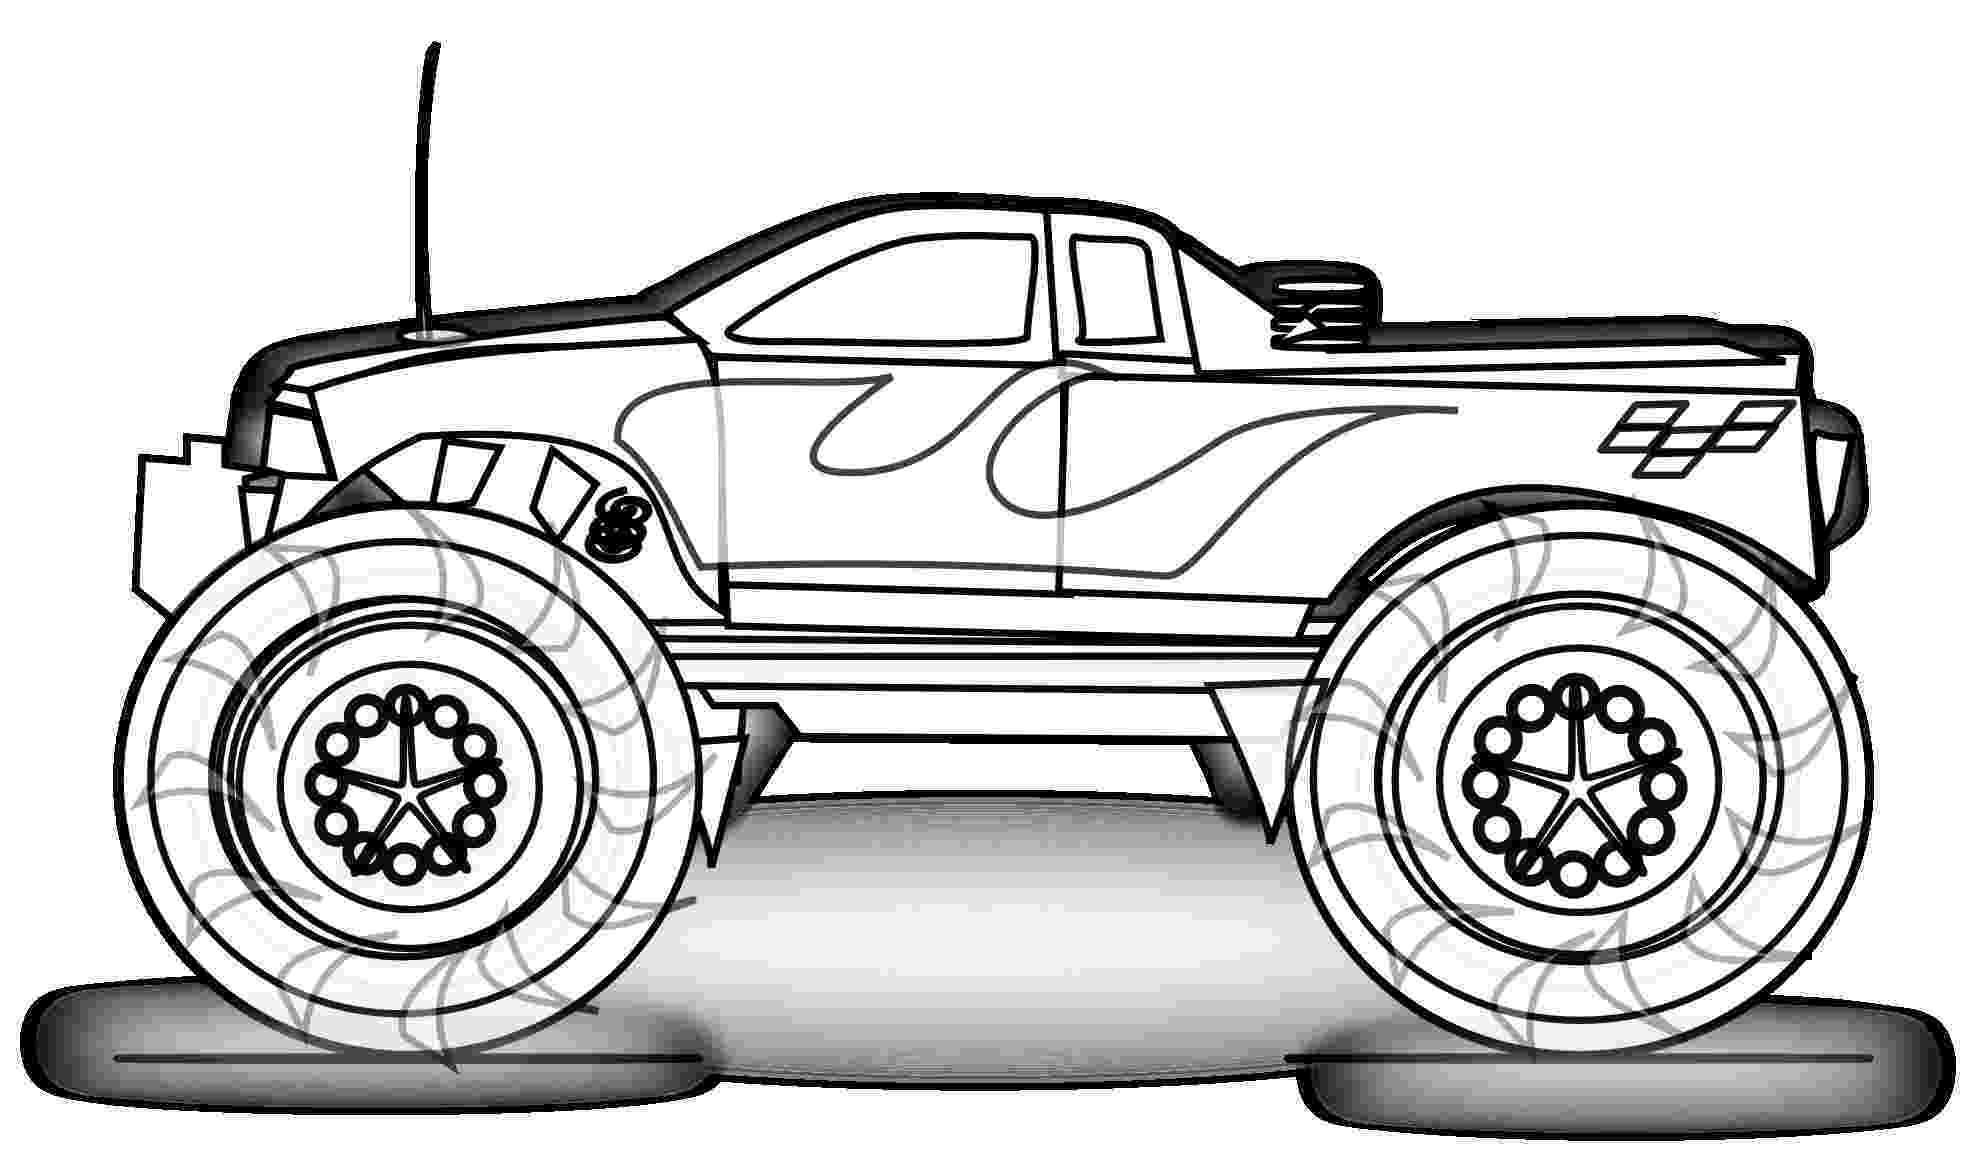 racecar coloring page koenigsegg race car sport coloring page koenigsegg car page coloring racecar